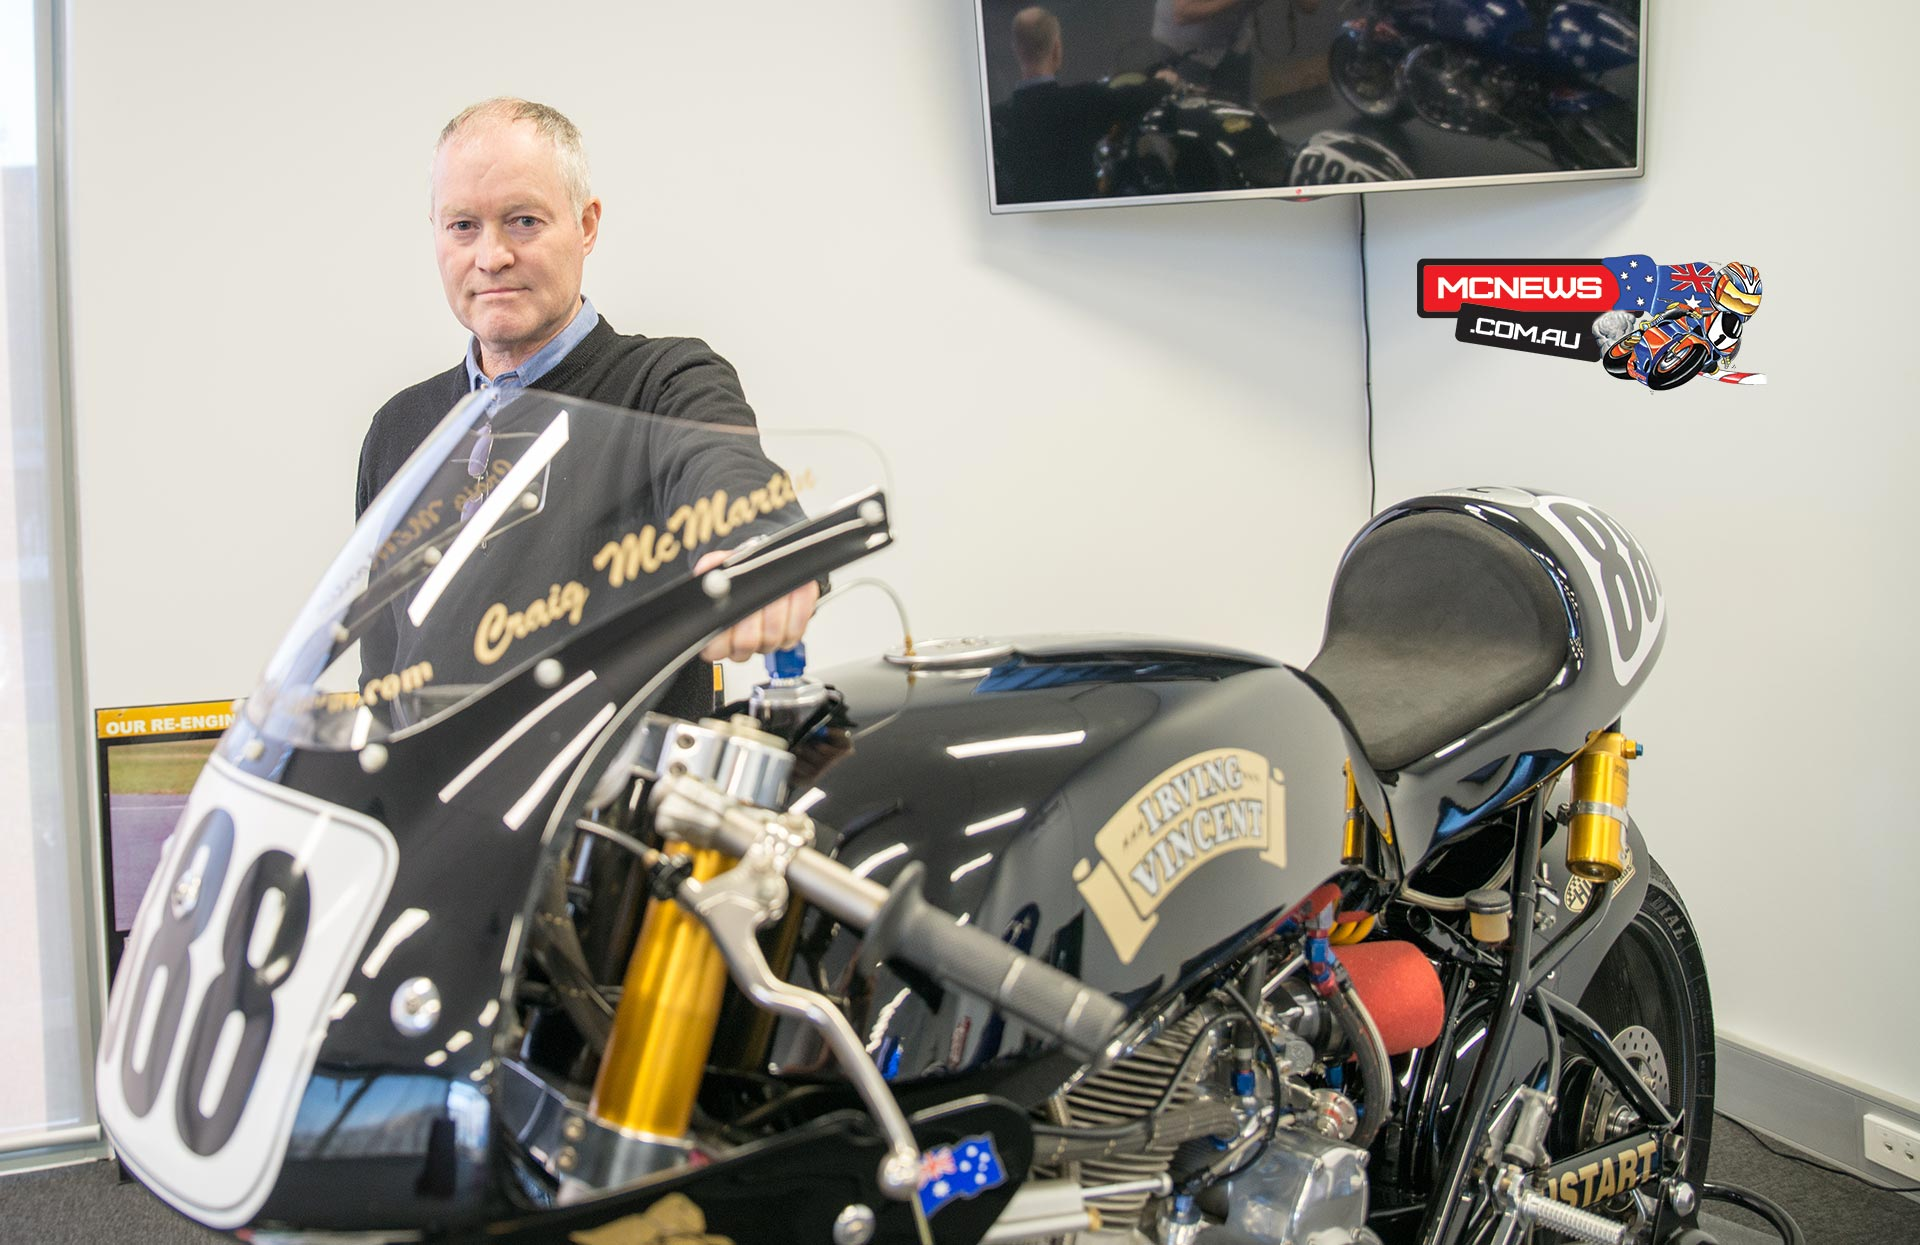 Ken Horner Engineering Open Day 2014 - Behind the Irving Vincent